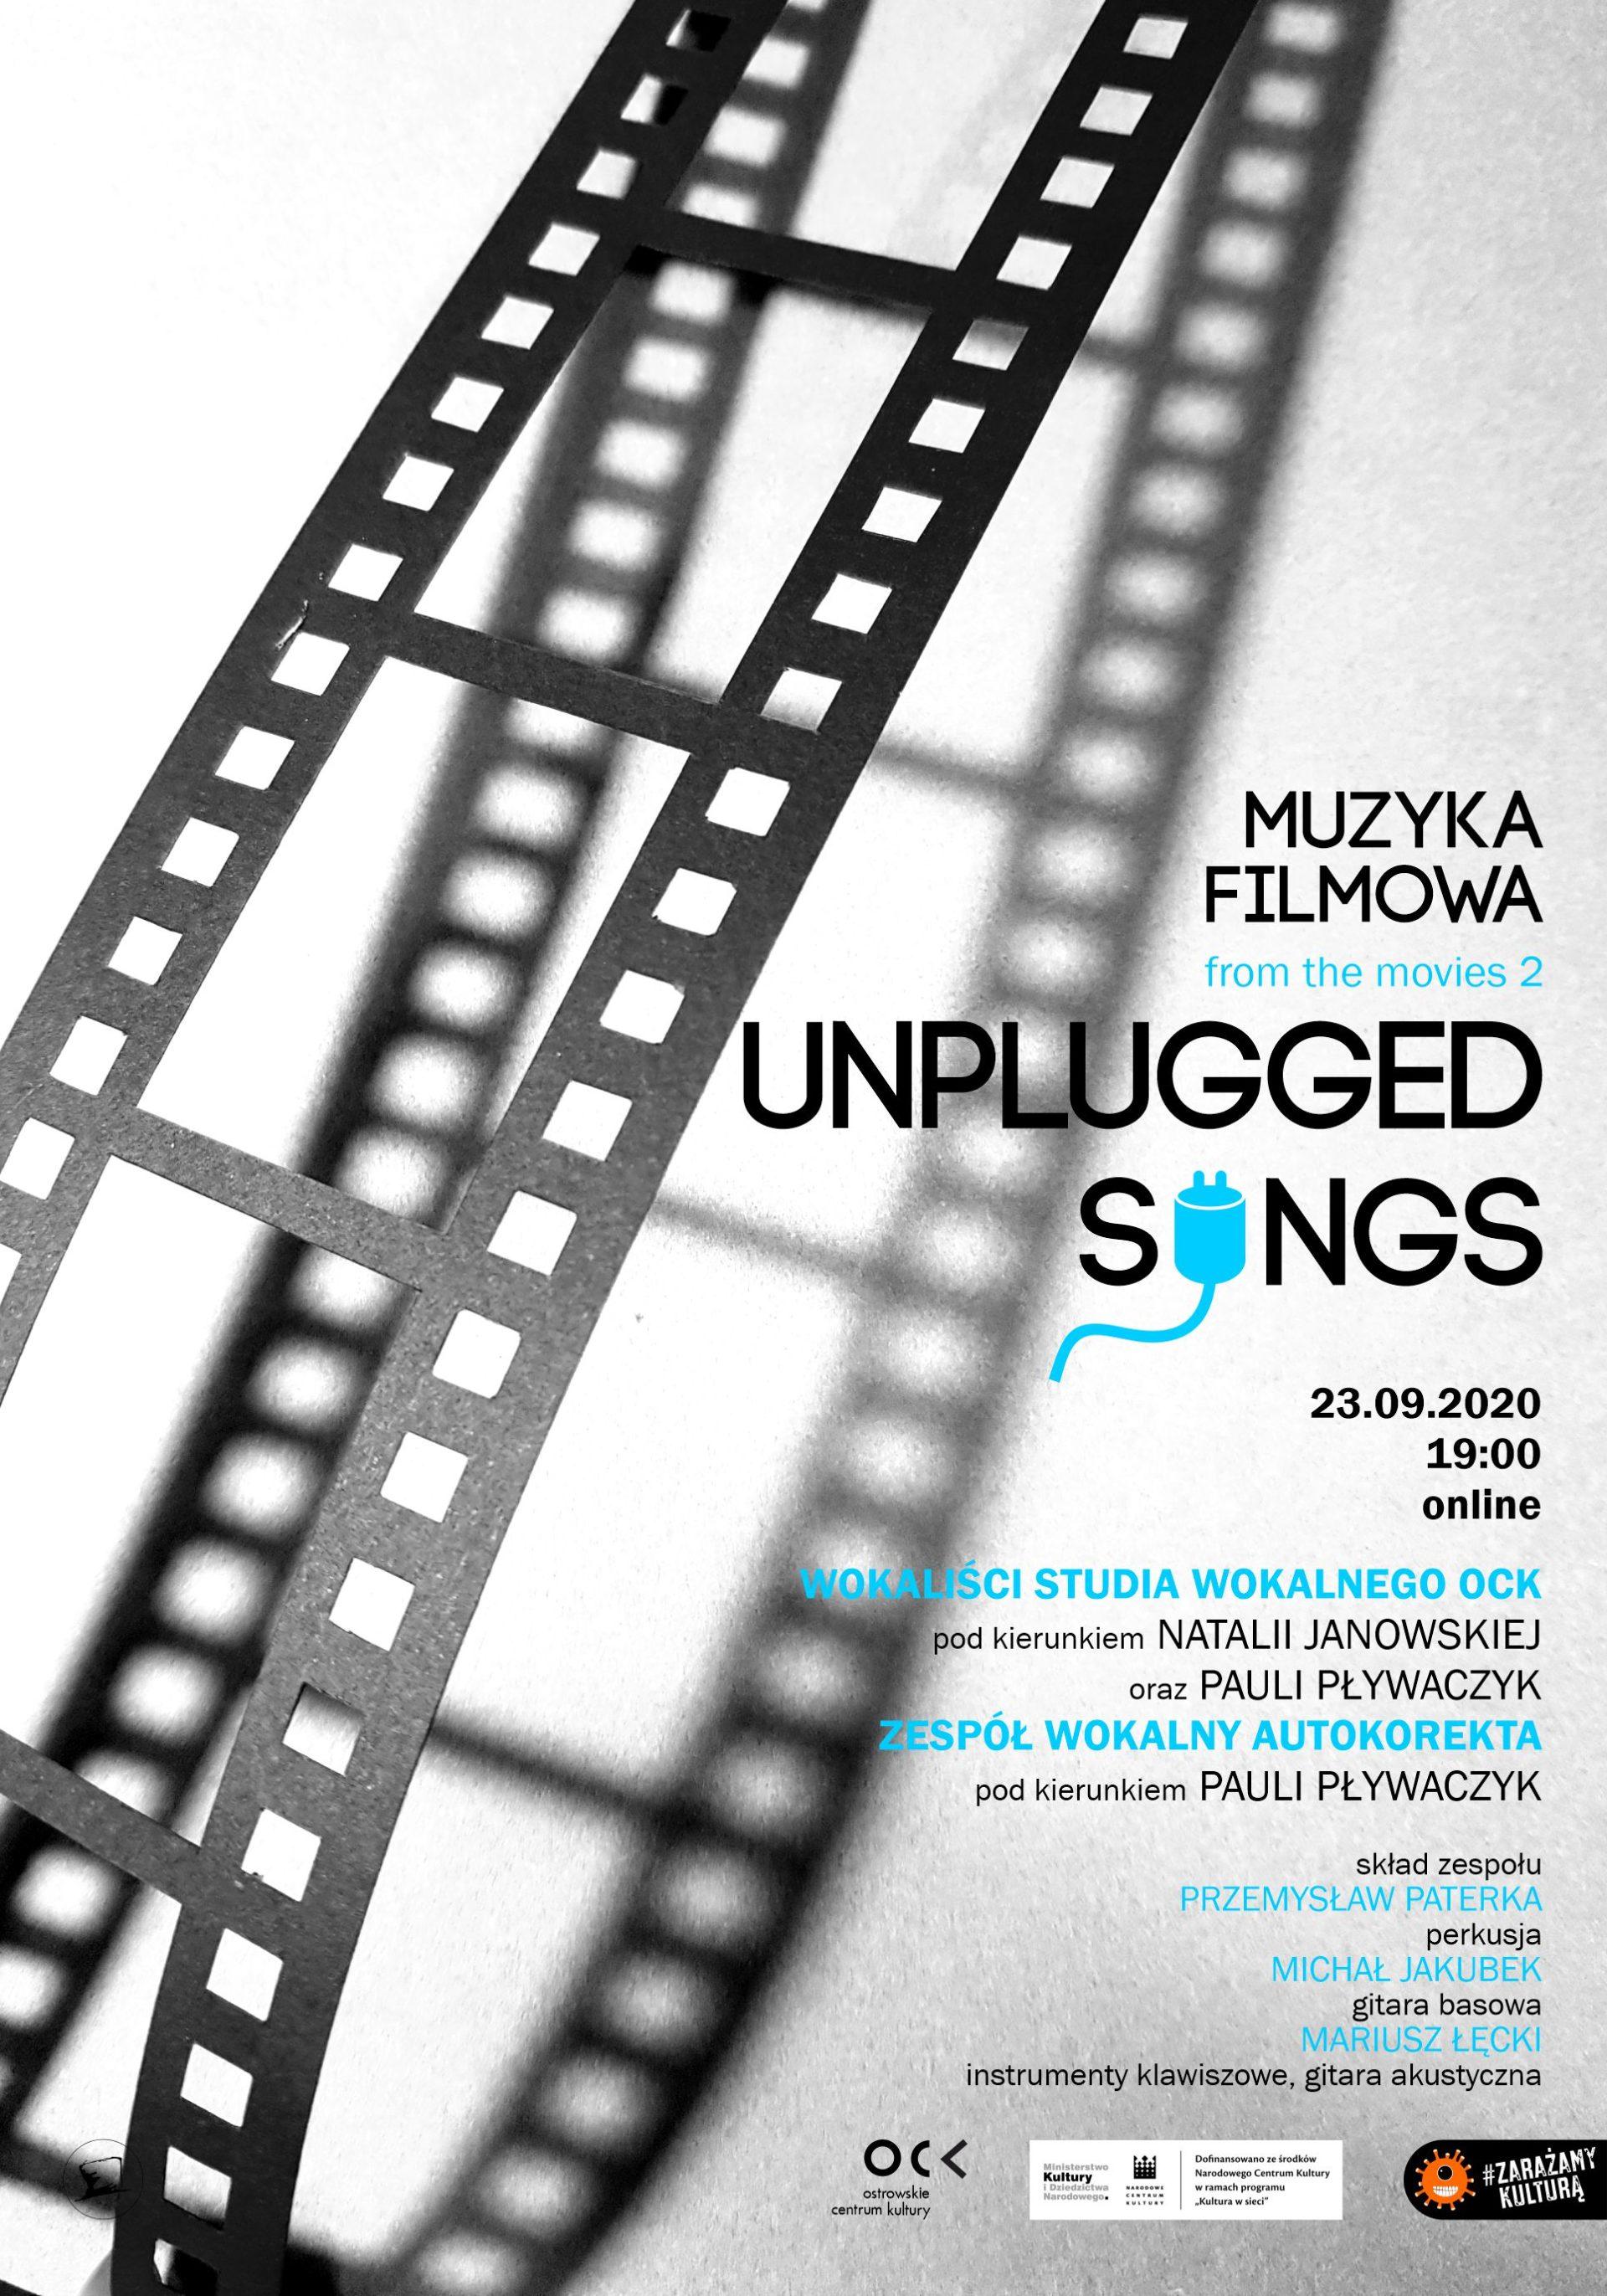 Unplugged Songs from the movies 2 | Muzyka Filmowa